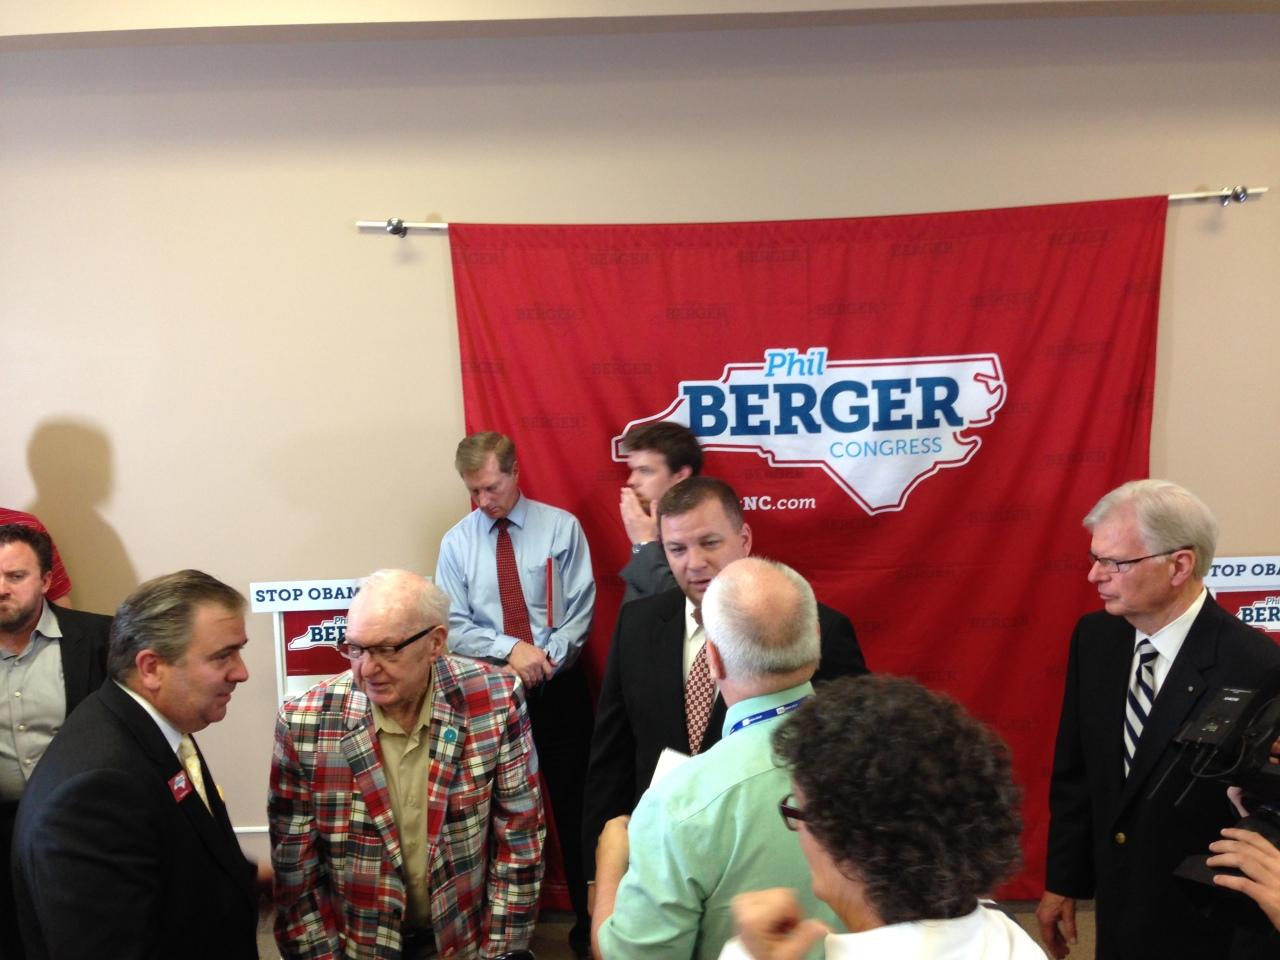 Congressman Coble and Phil Berger, Jr. after the Endorsement